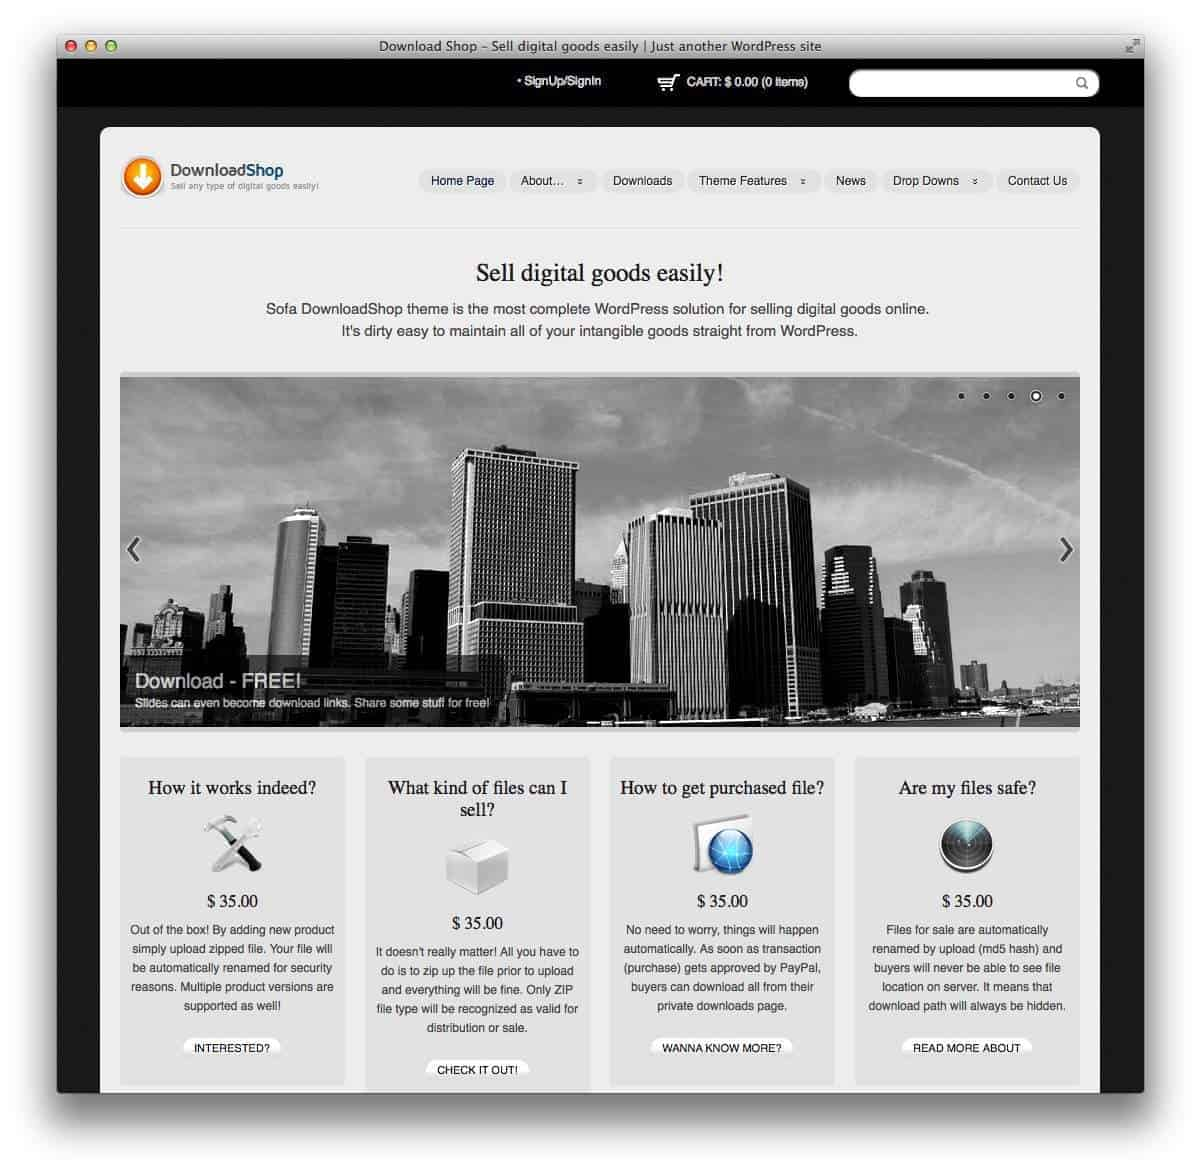 downloadshop-sell-digital-goods